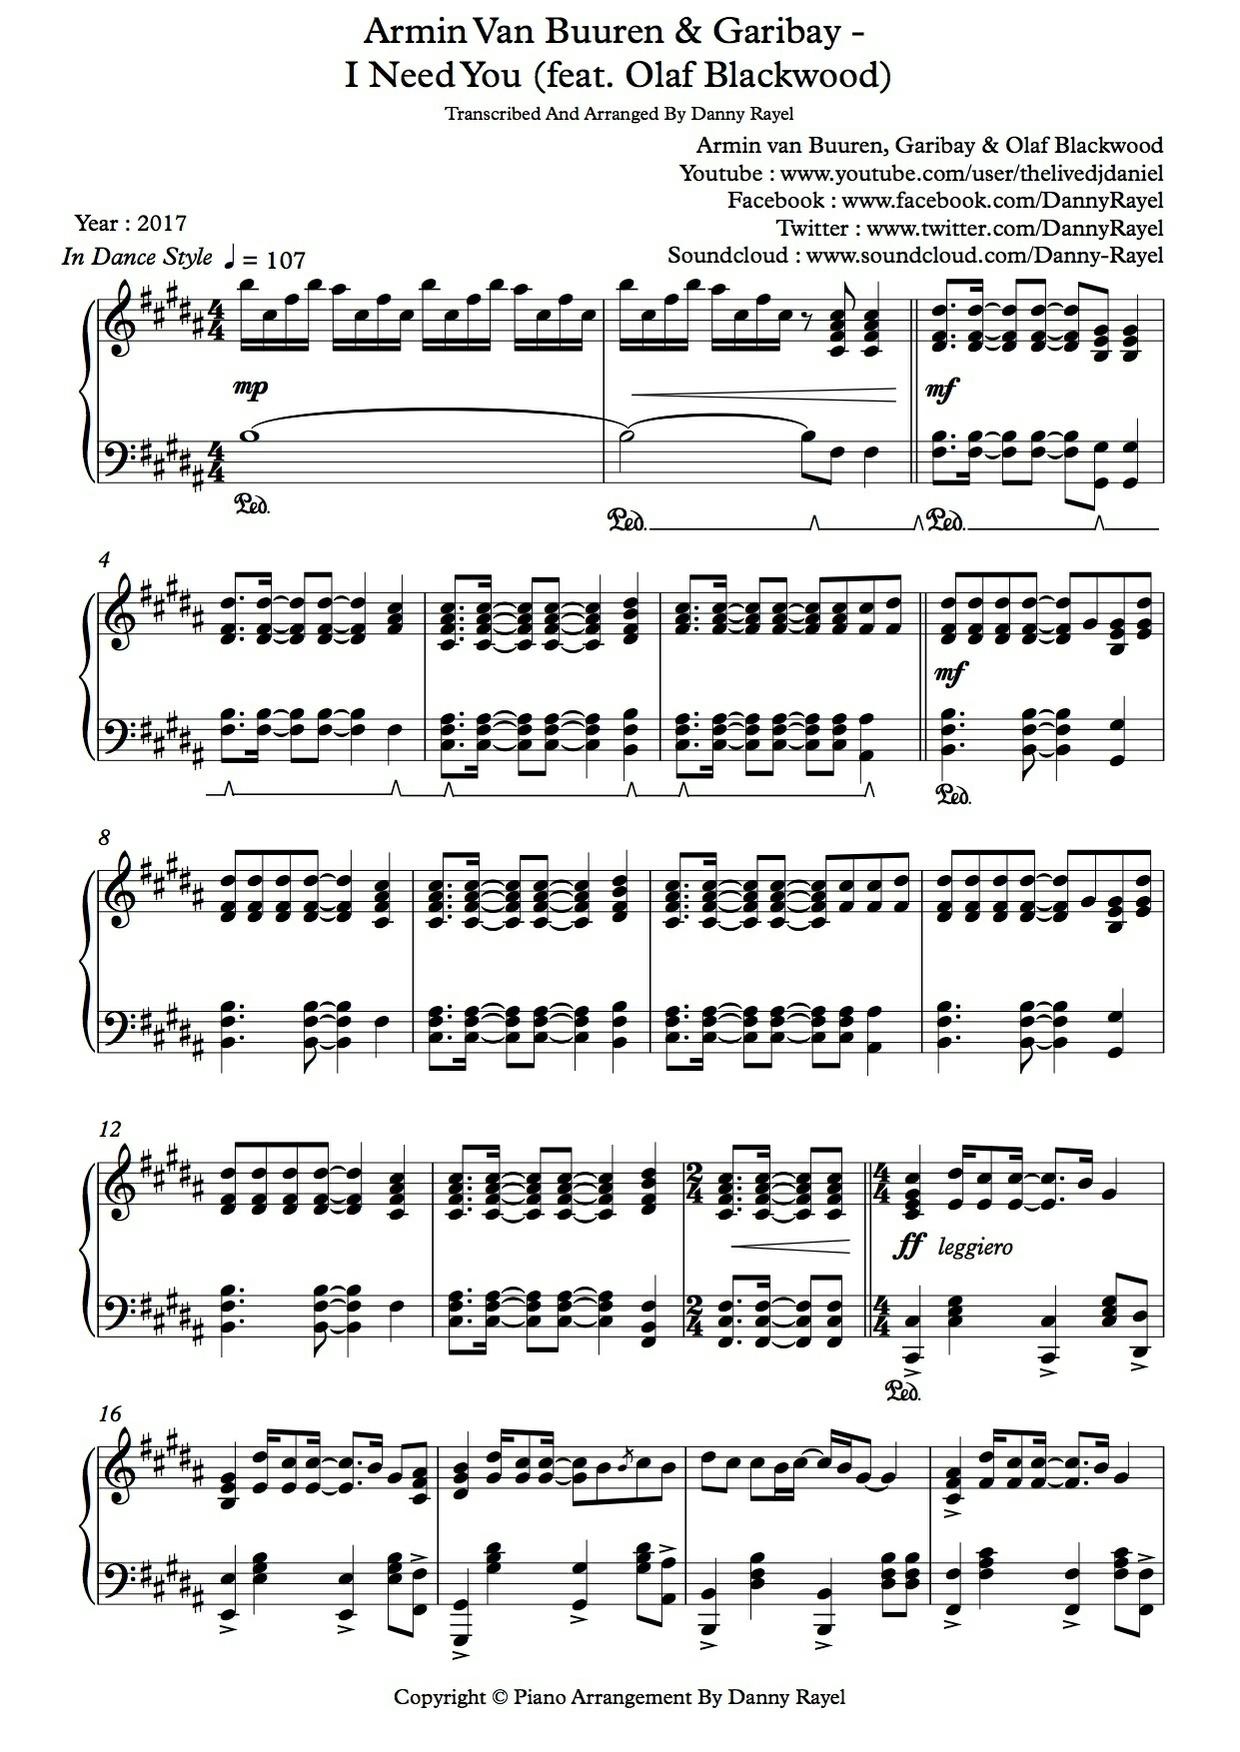 Armin van Buuren & Garibay - I Need You (feat. Olaf Blackwood) (P.A By Danny Rayel) (Sheet Music)